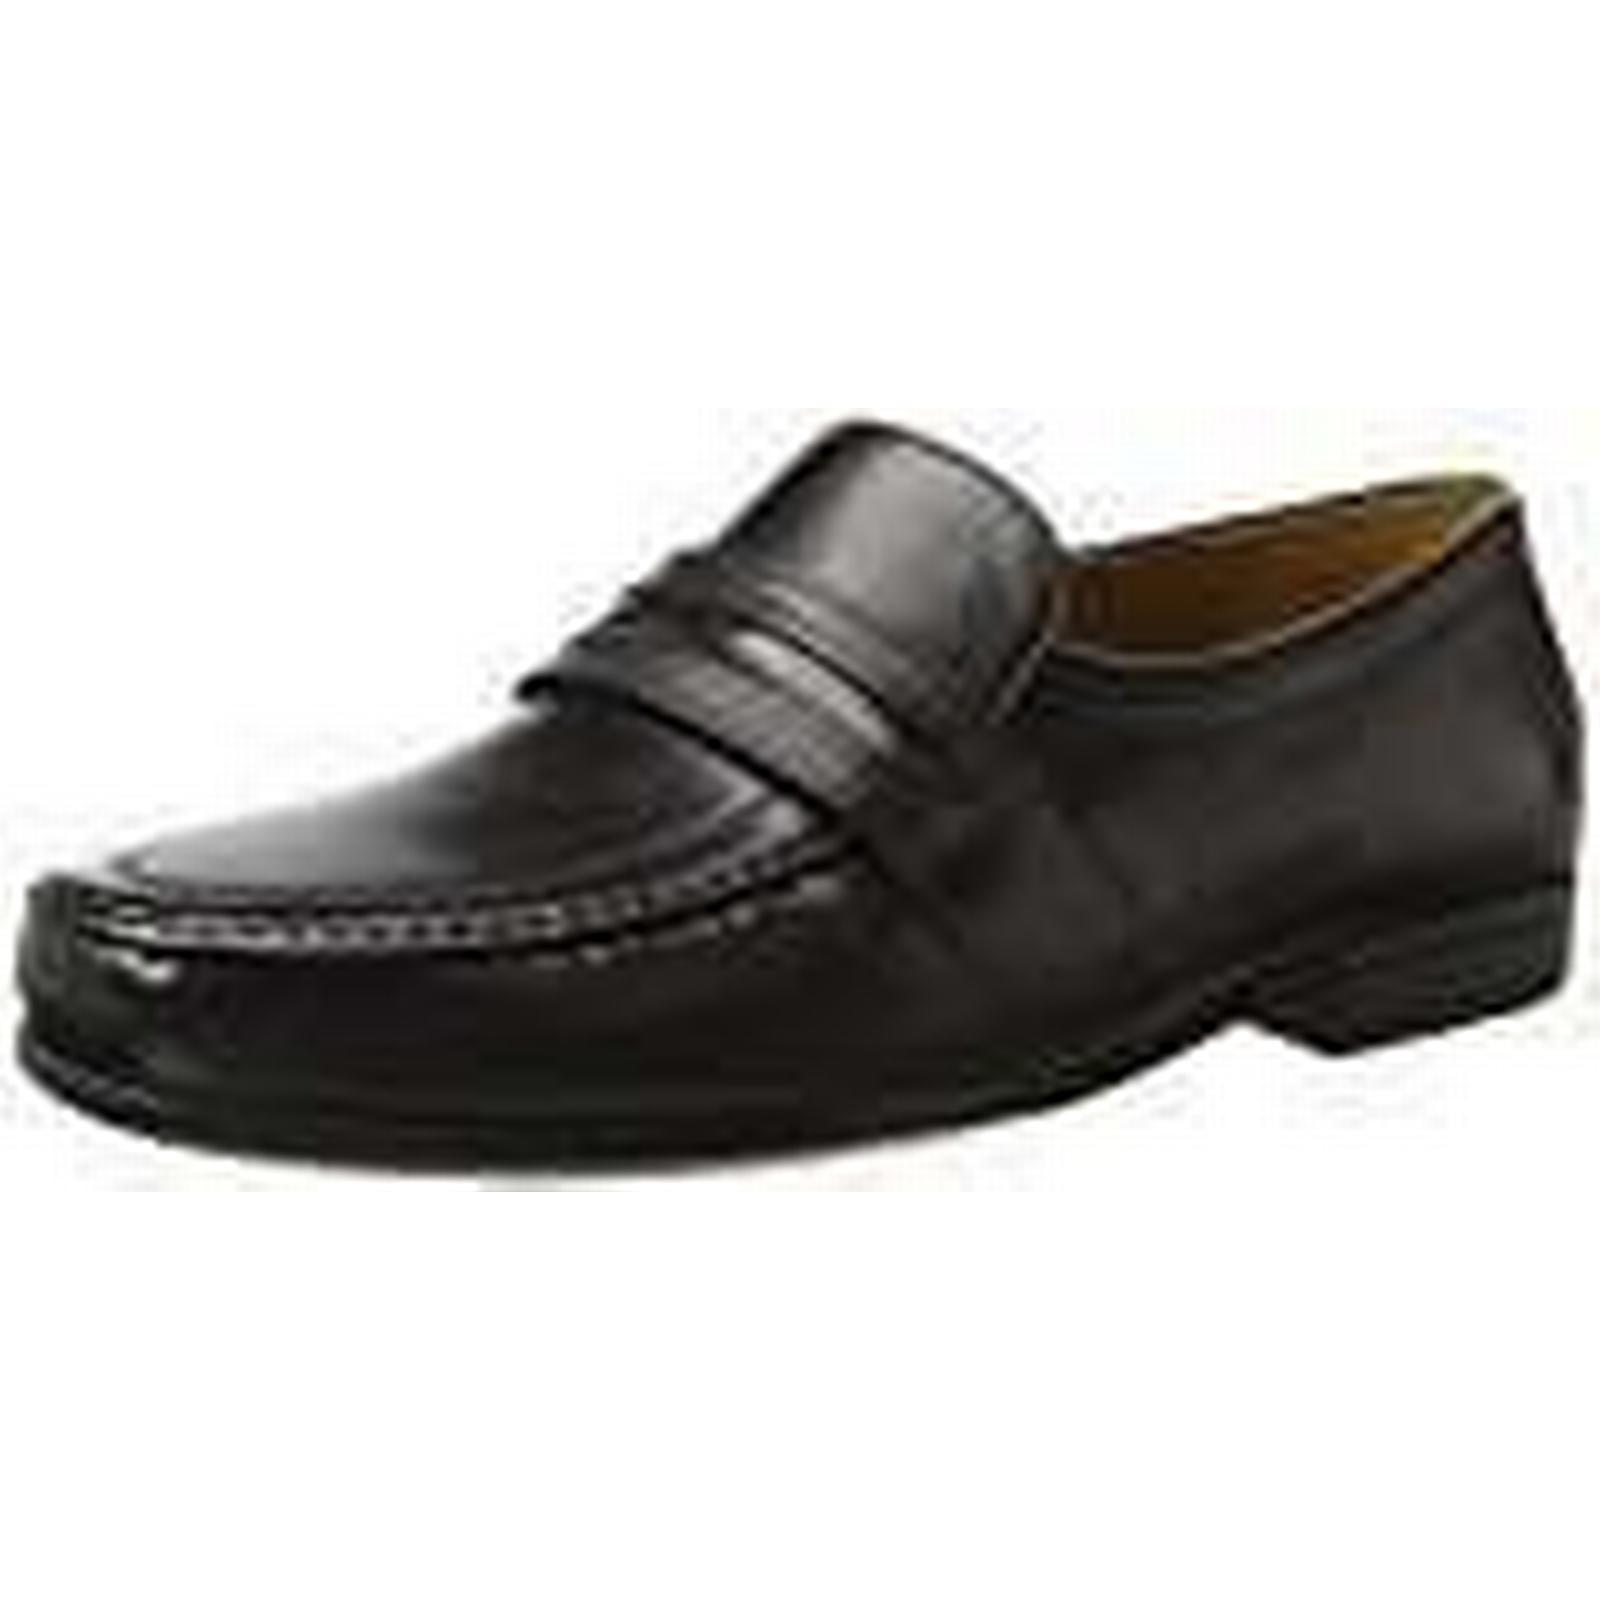 Clarks Men's 9.5 Claude Aston Loafers, (Black Leather-), 9.5 Men's UK 9.5 UK d464ec